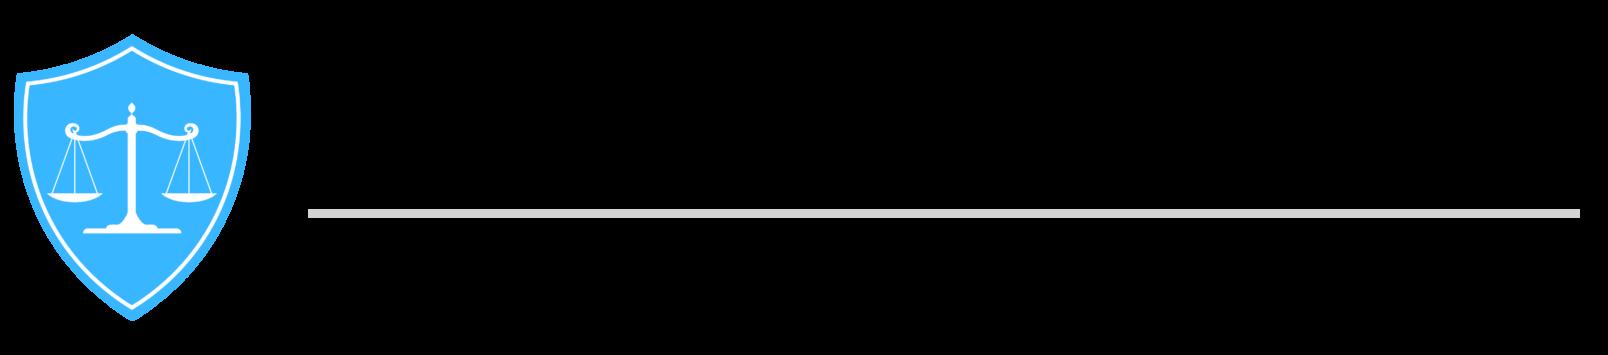 Dunmire Law Logo